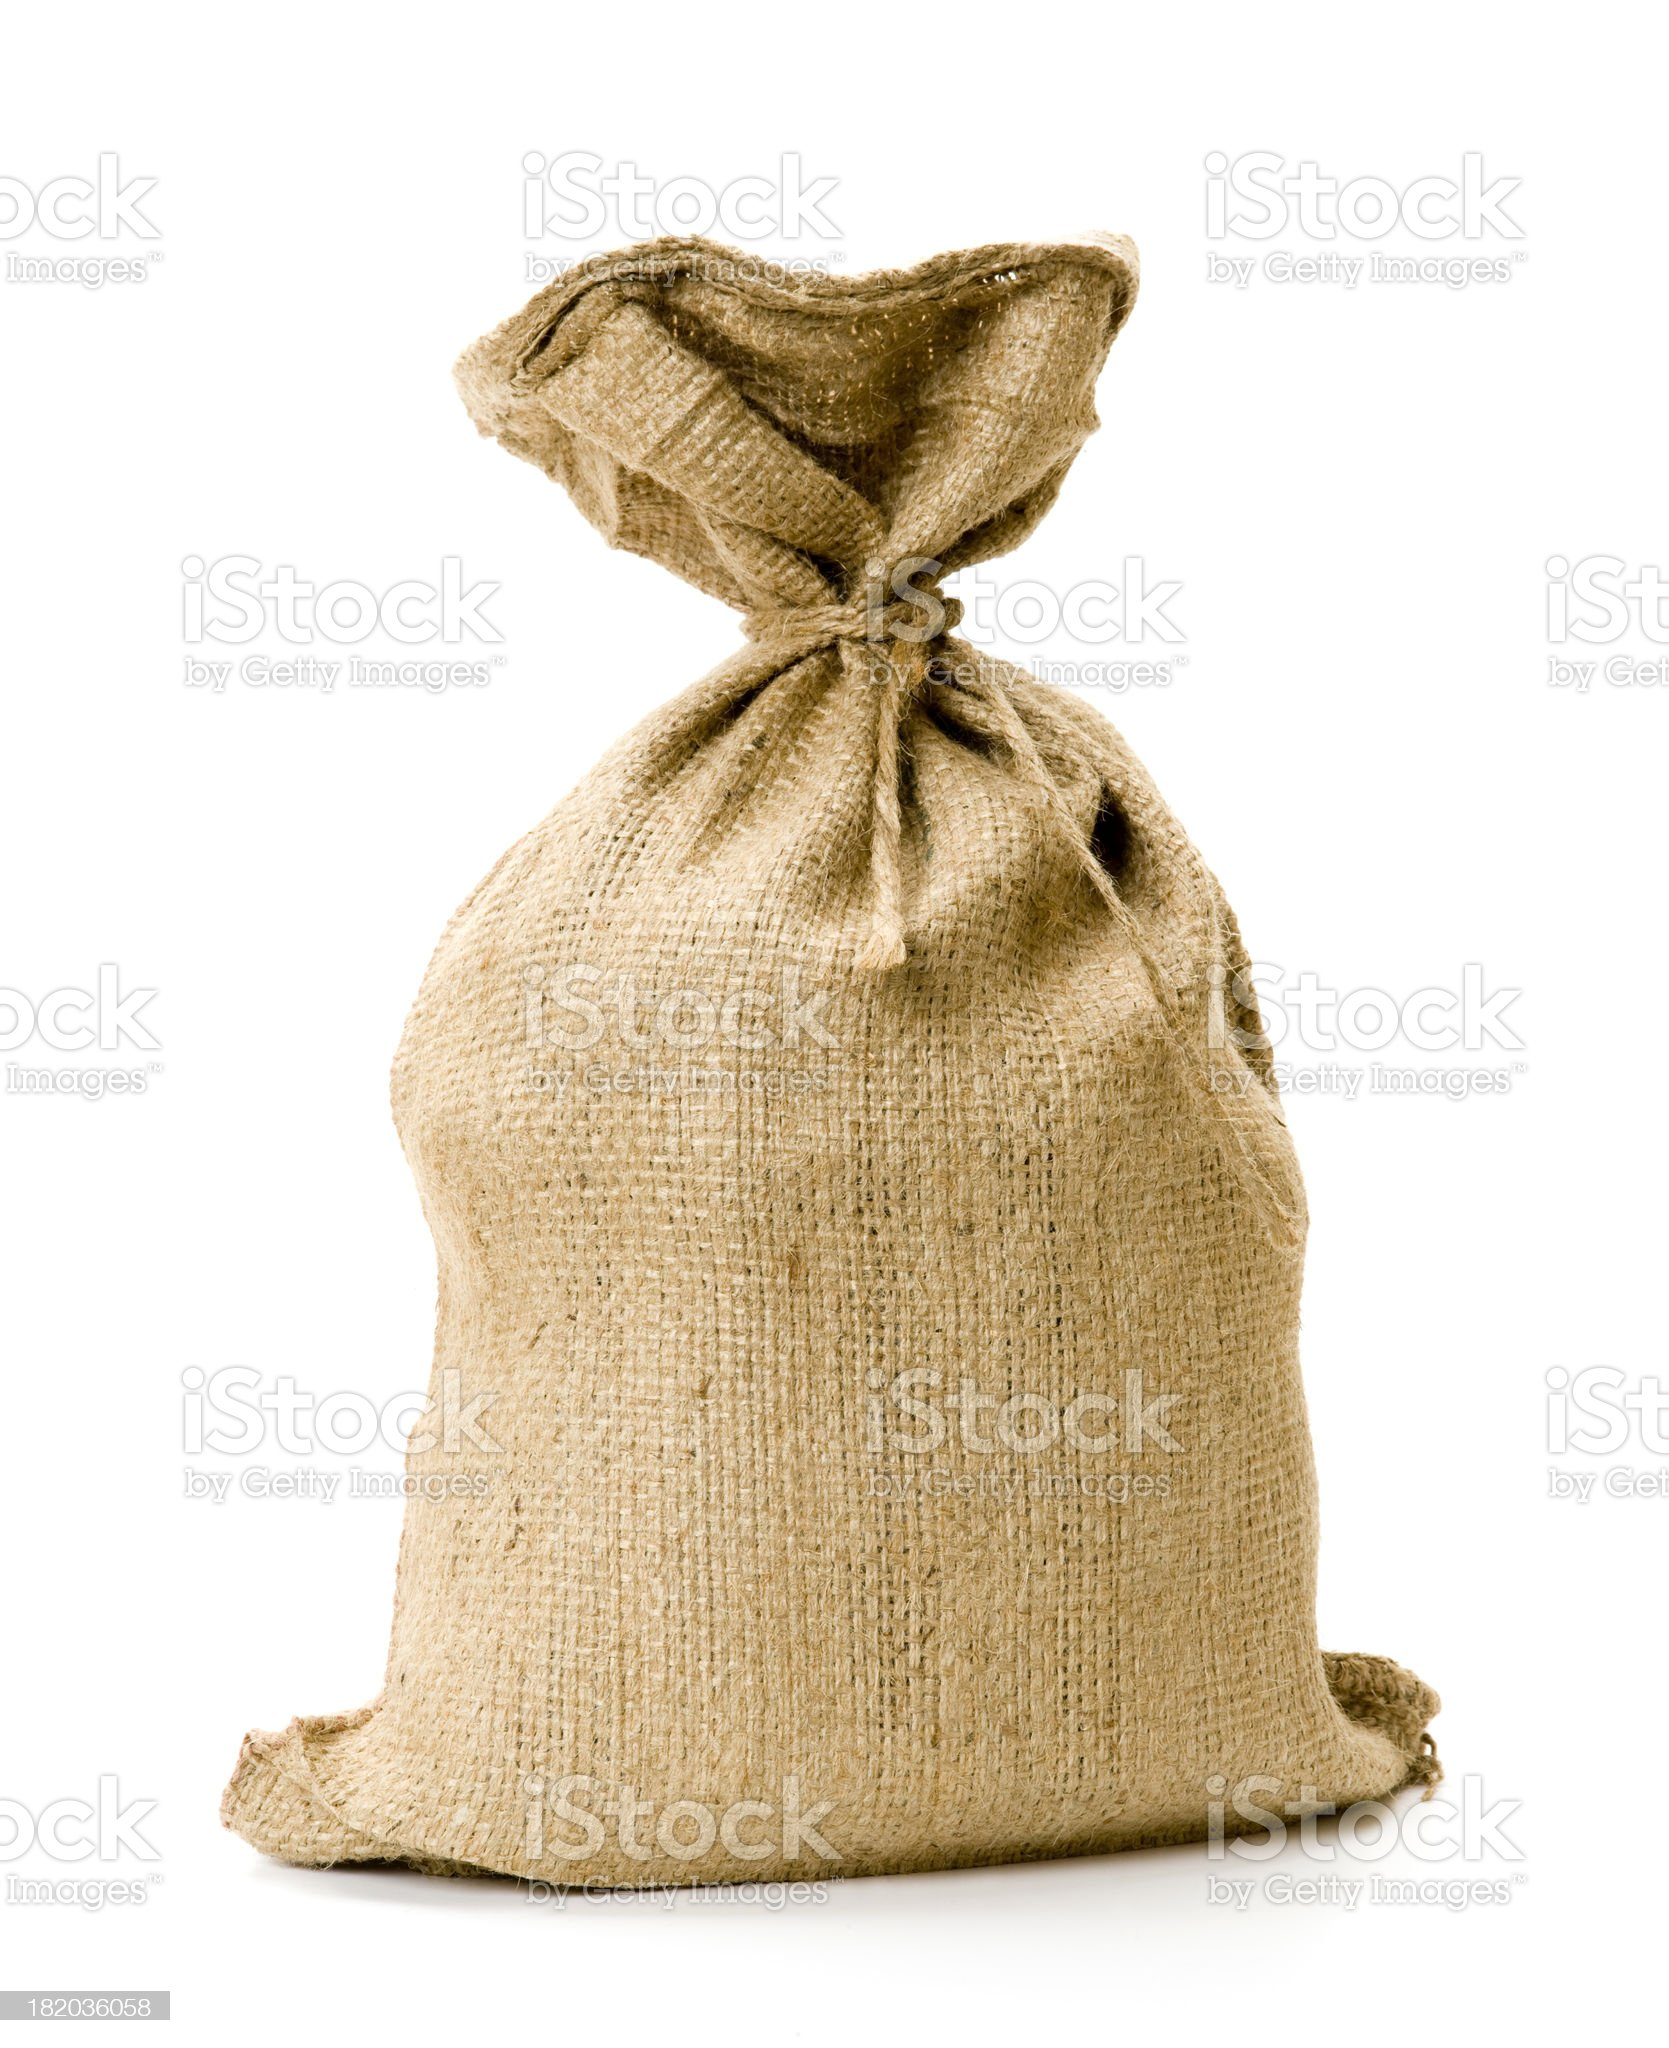 Burlap sack royalty-free stock photo